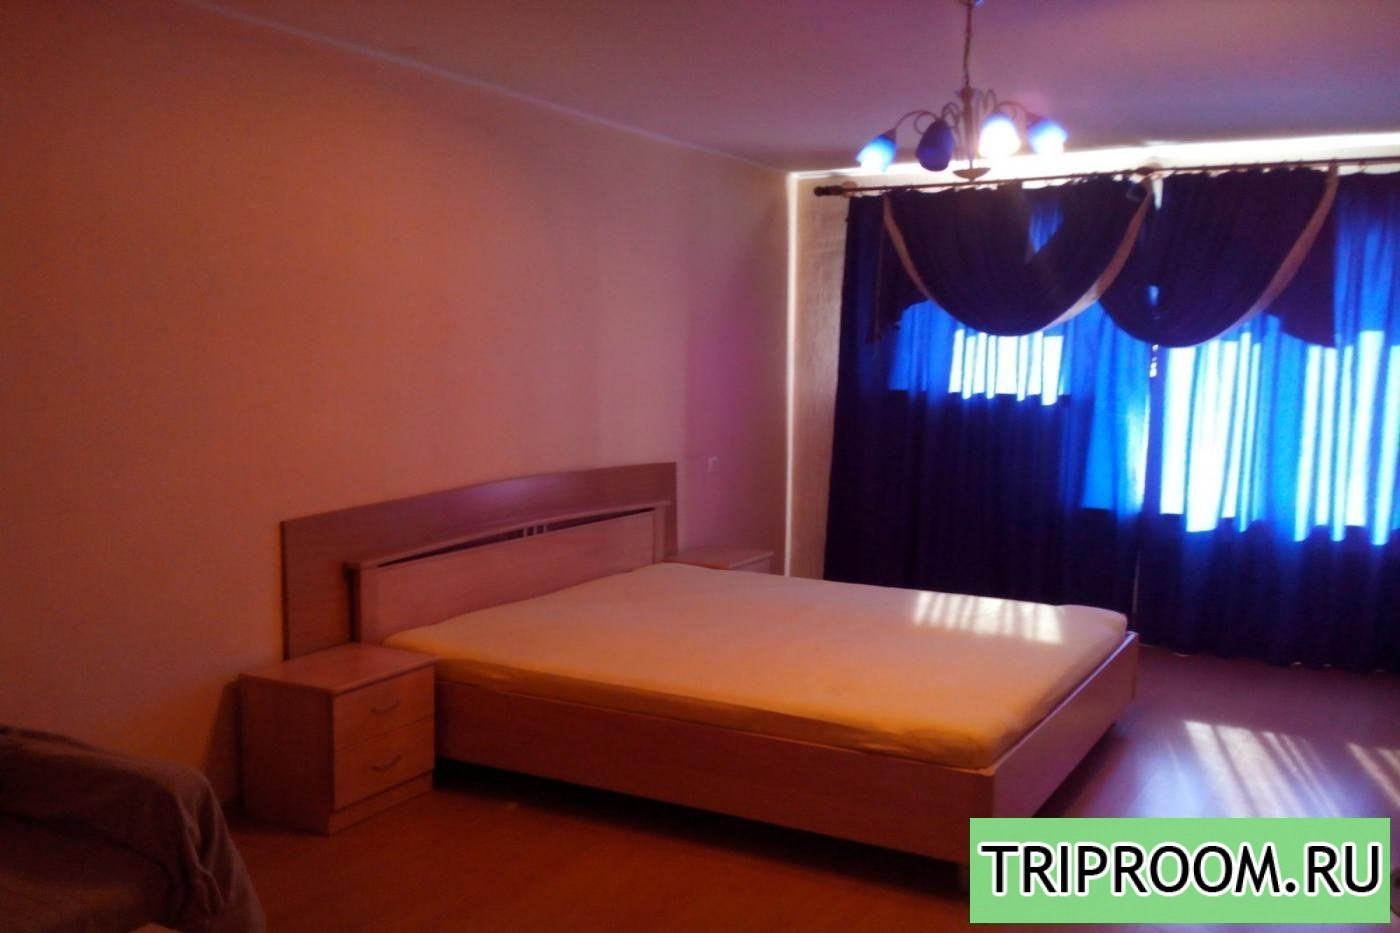 2-комнатная квартира посуточно (вариант № 10044), ул. Ломоносова улица, фото № 1